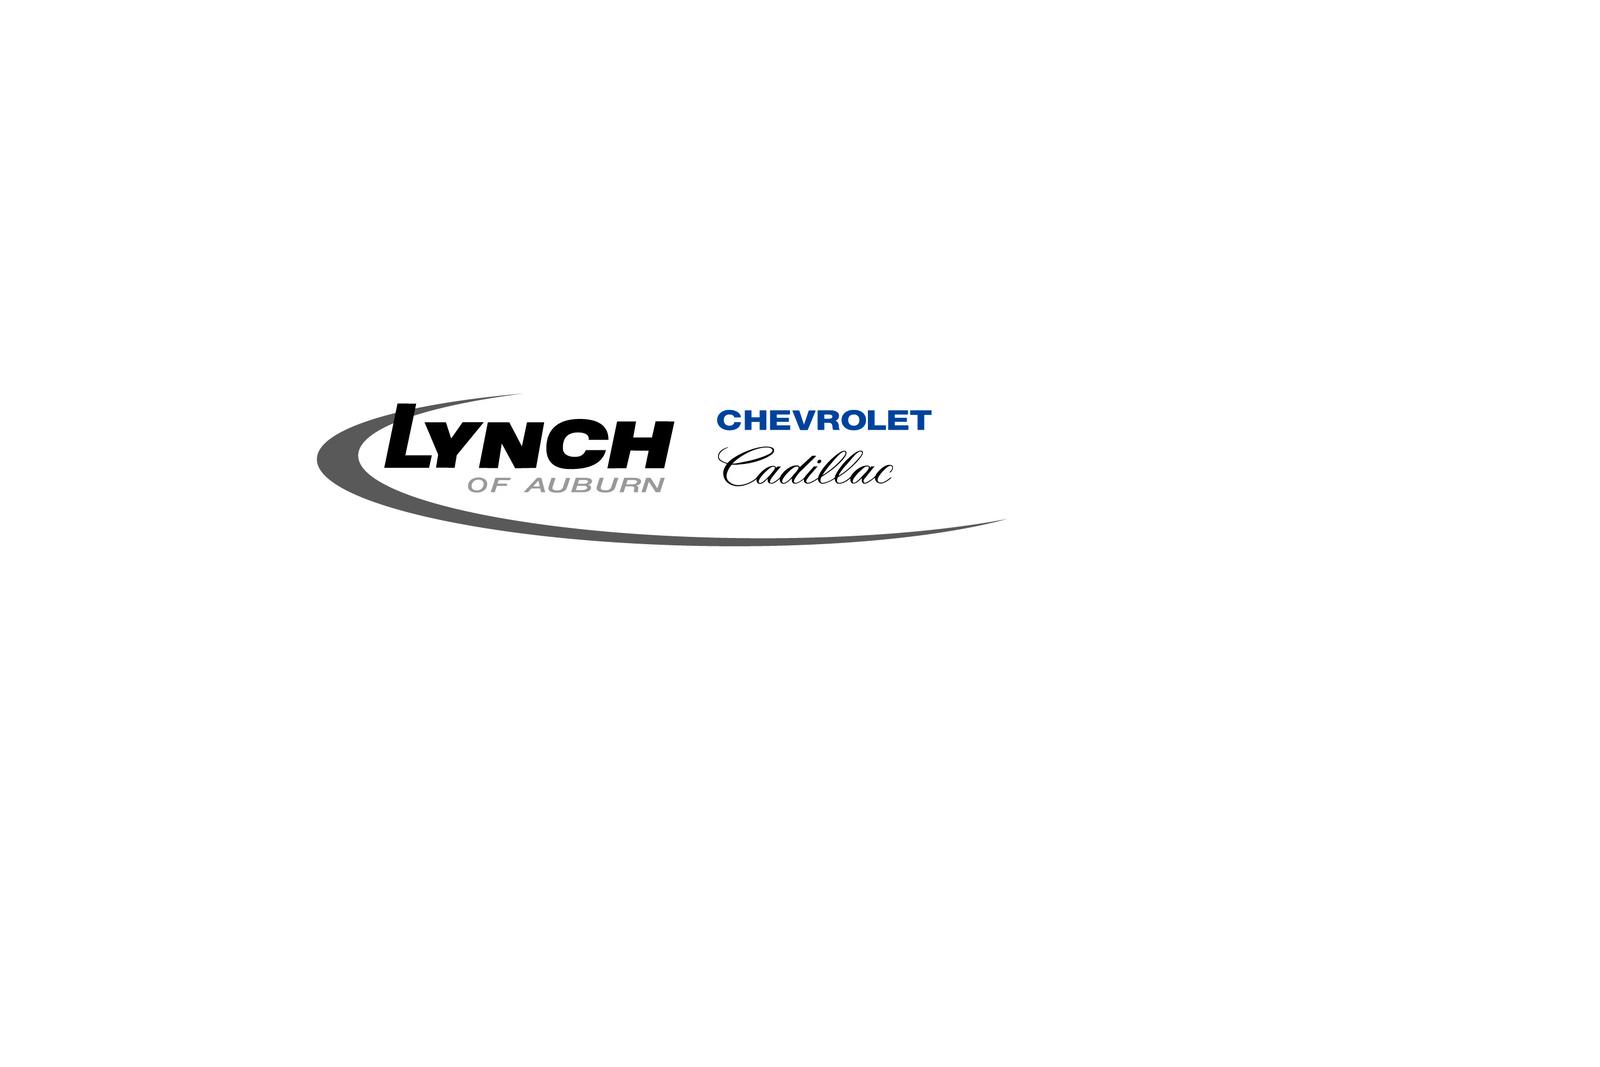 Lynch Chevrolet Cadillac Auburn Al Read Consumer Reviews